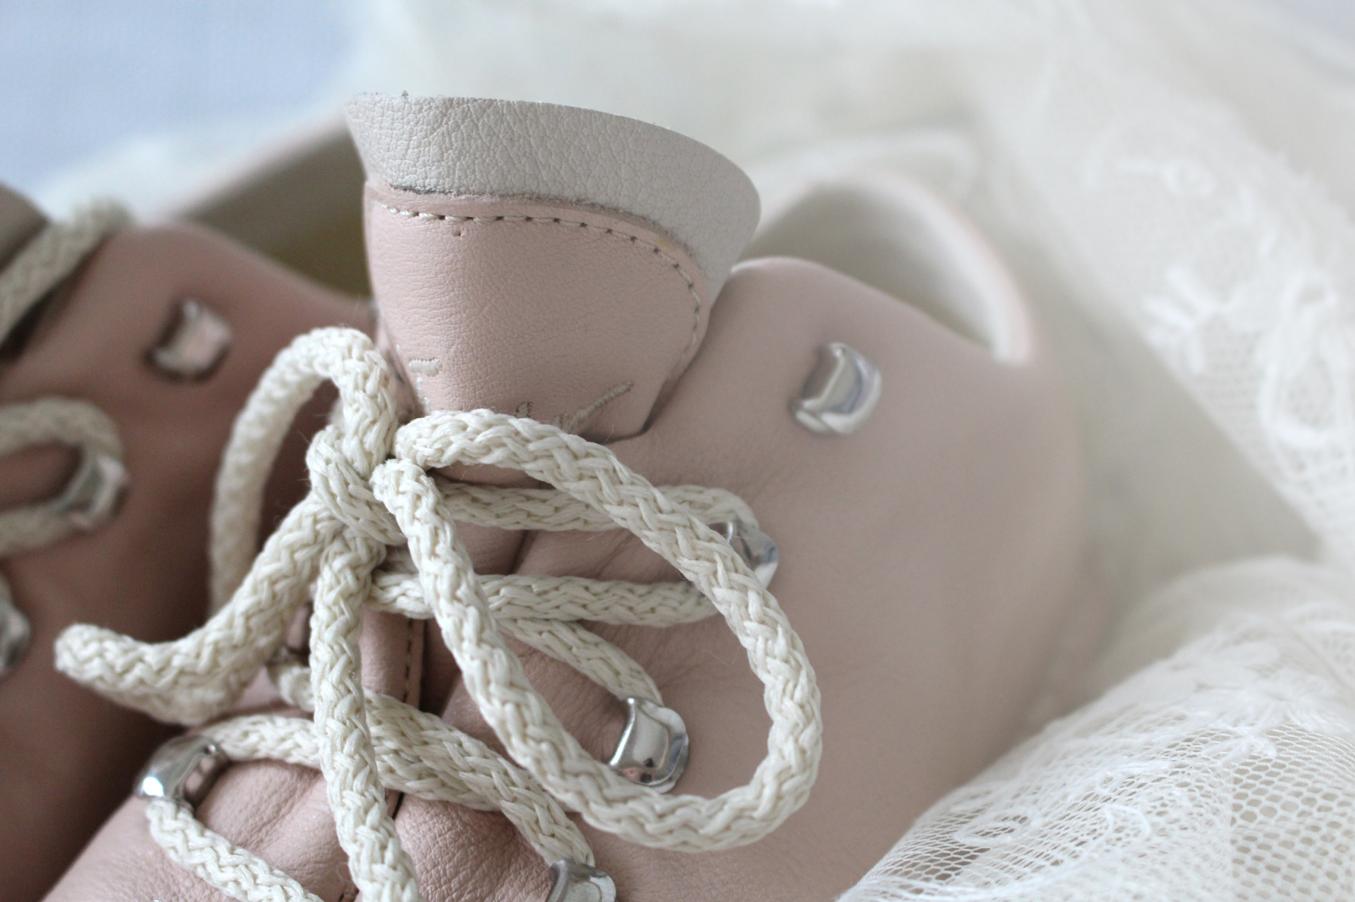 maybeyoulike_wedding_shoes_6